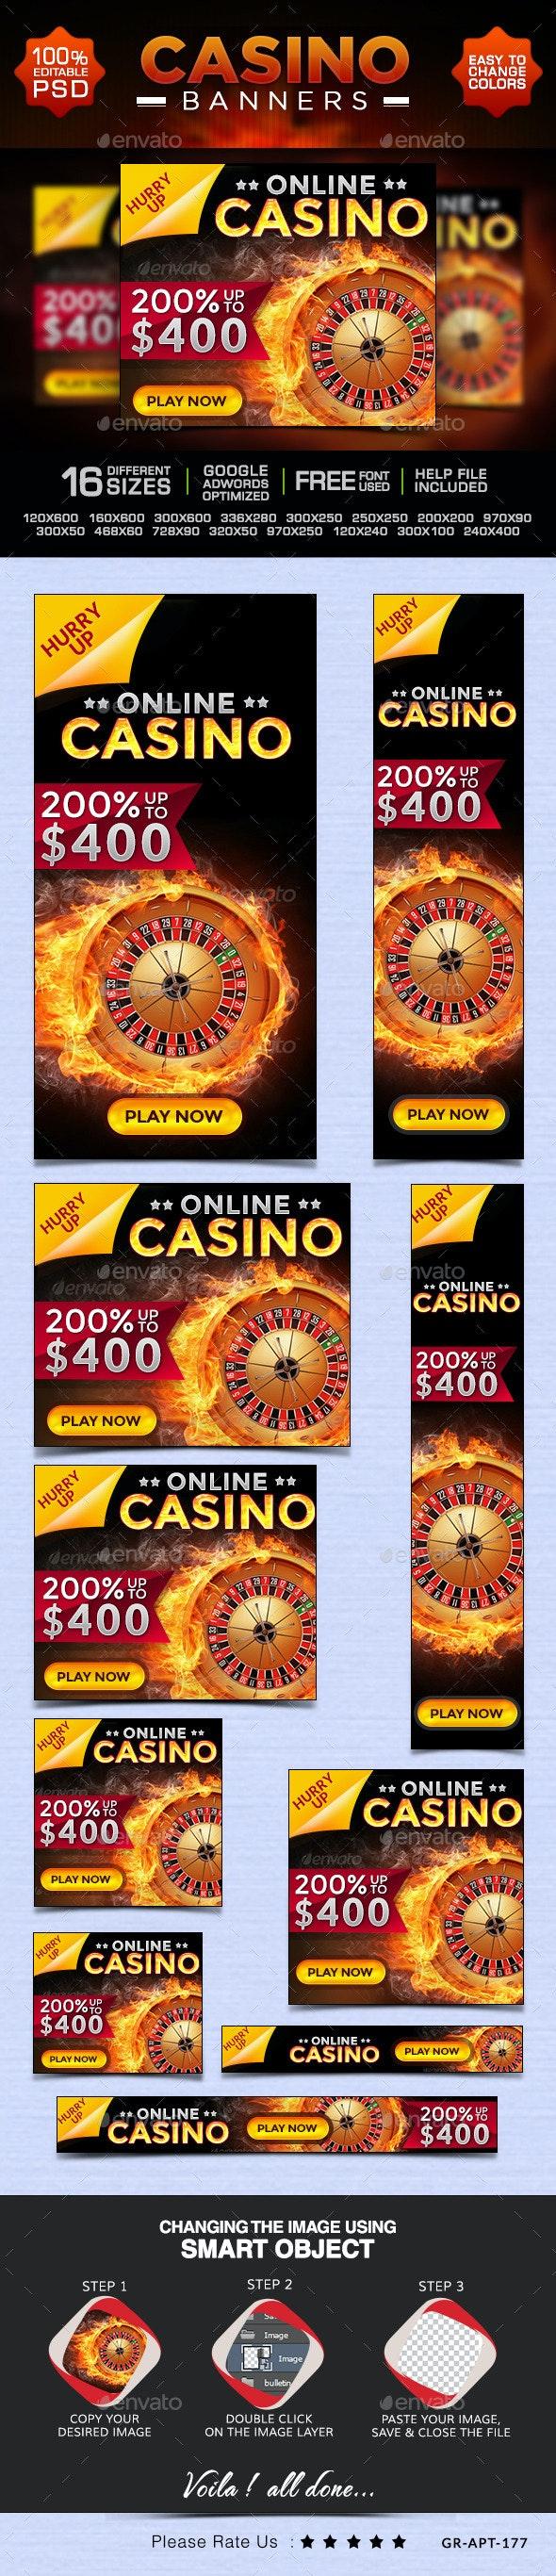 Casino Banner Design Set - Banners & Ads Web Elements